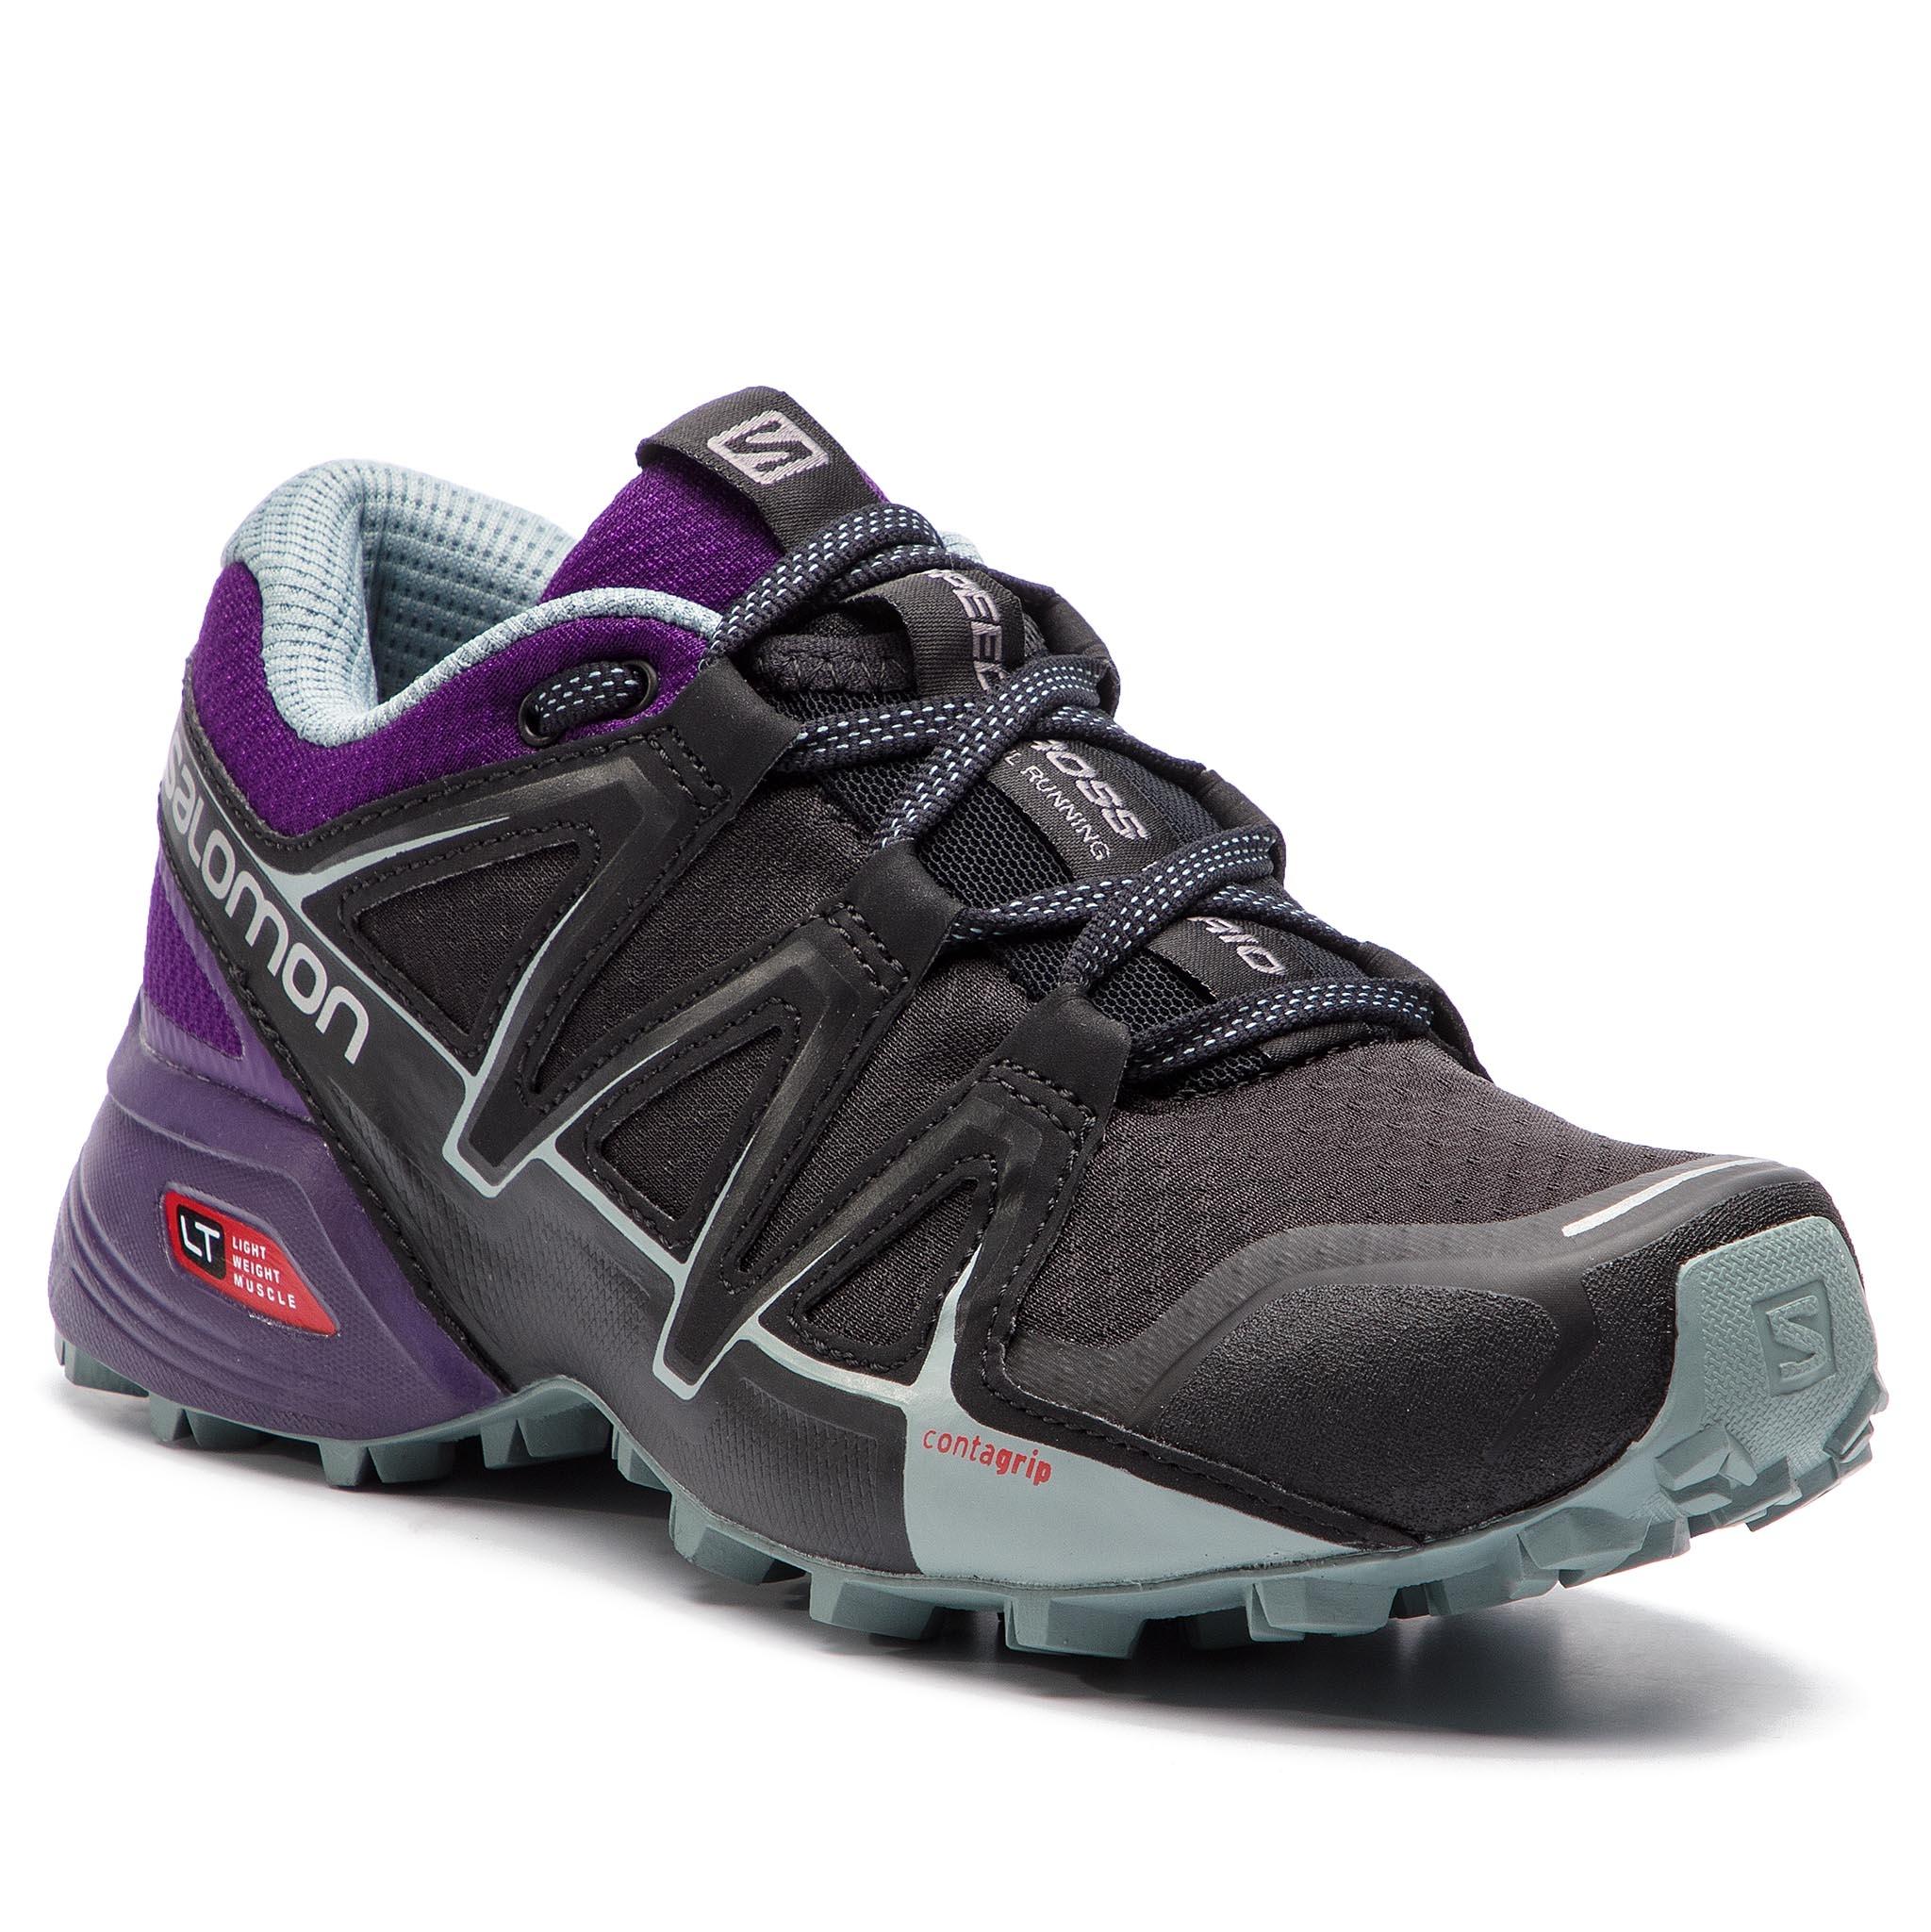 online store 0cf25 5934c Shoes SALOMON Speedcross Vario 2 W 406107 20 V0 Black Acai Lead